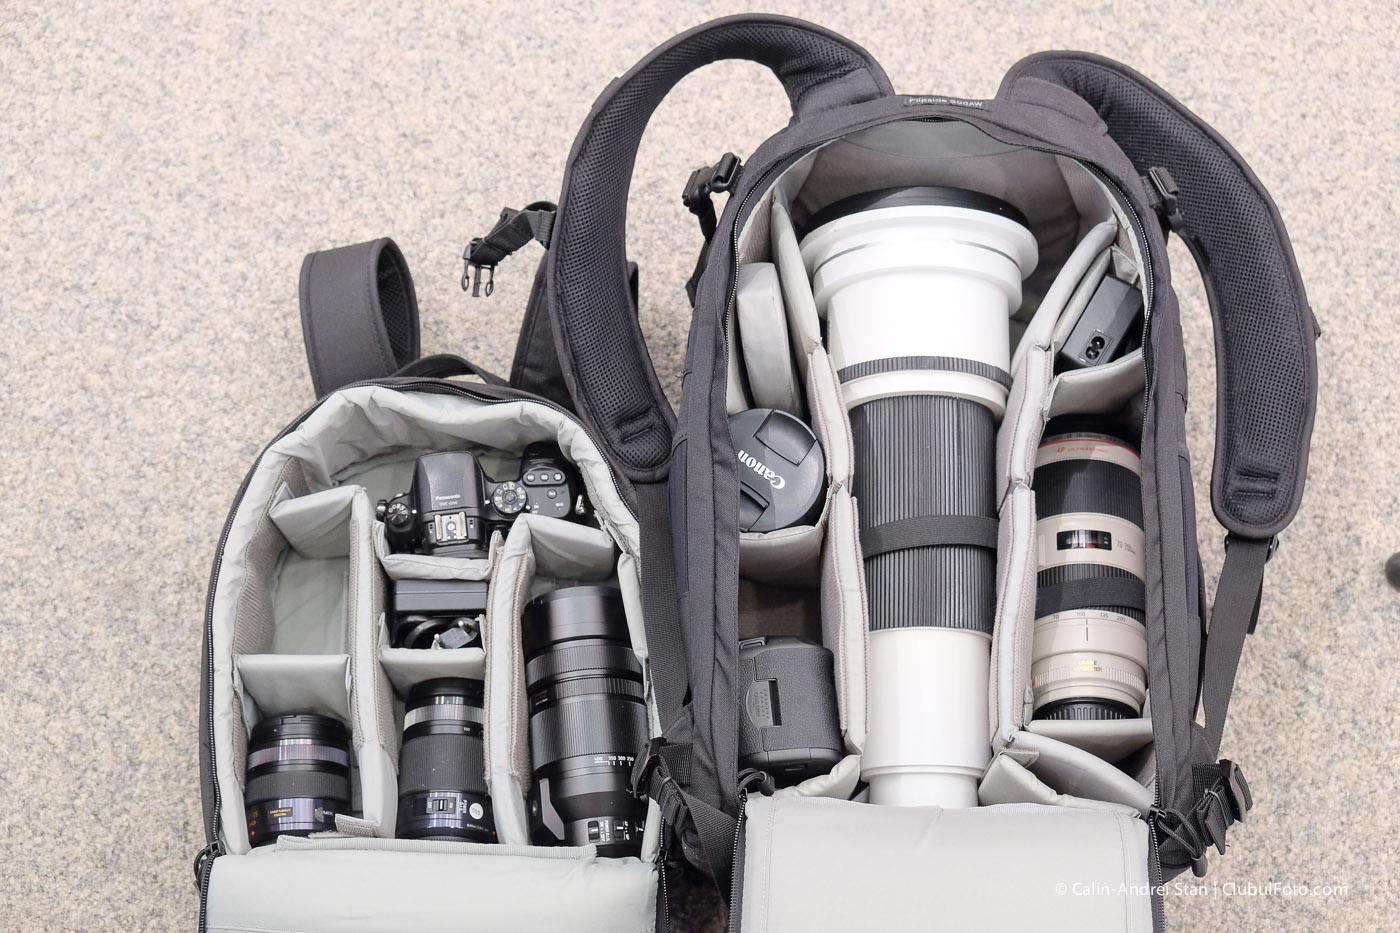 Un aparat foto mirrorless cu 2-3 obiective ocupa jumatate din spatiul unui DSLR cu obiective echivalente